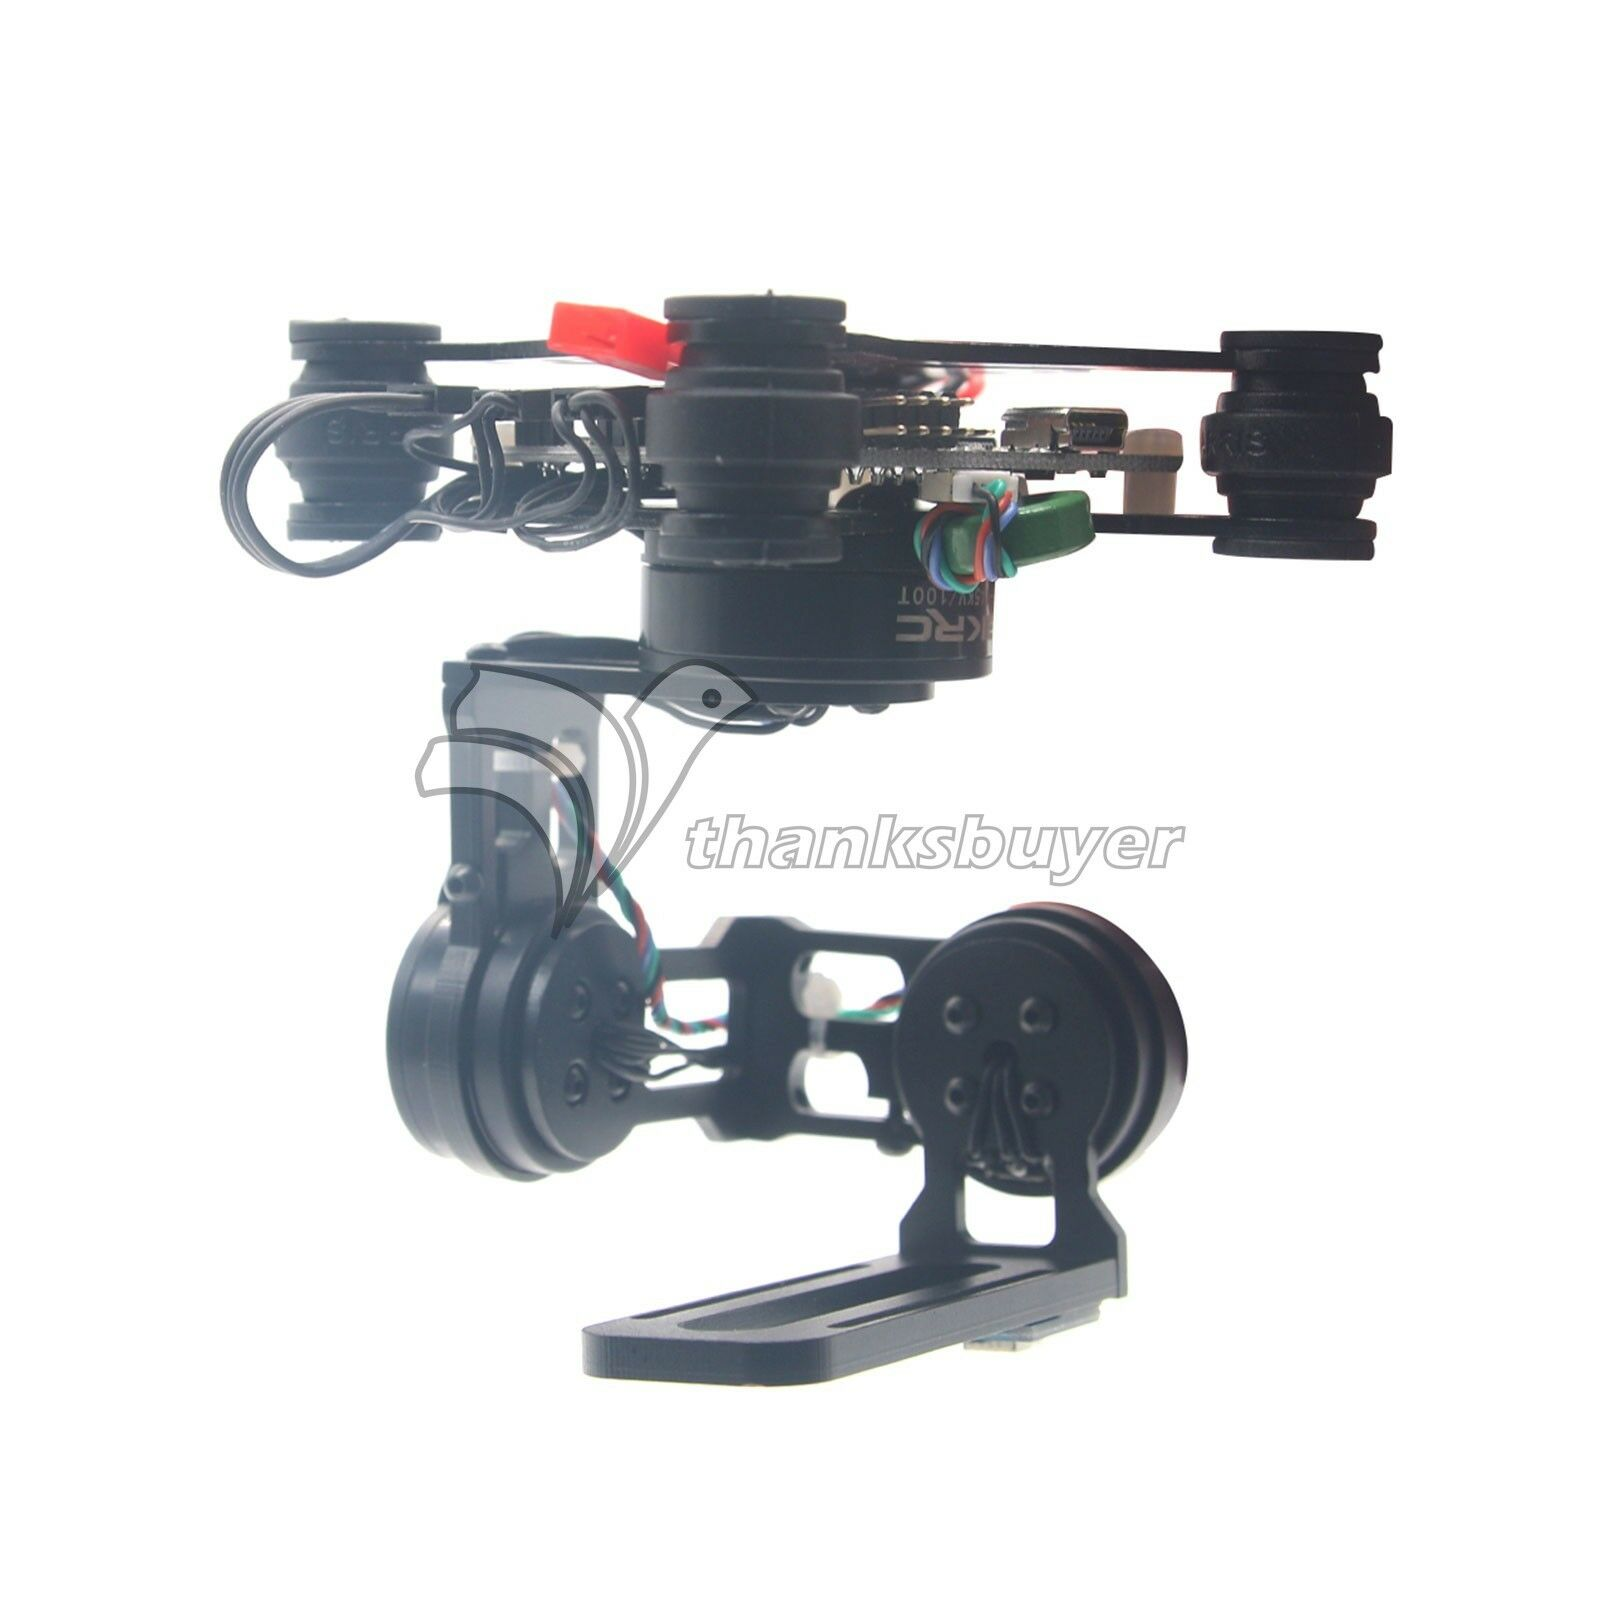 HAKRC Storm32 3 Axis Brushless Gimbal Stabilizer for Gopro3    Gopro4 FPV Drone  prezzi bassi di tutti i giorni